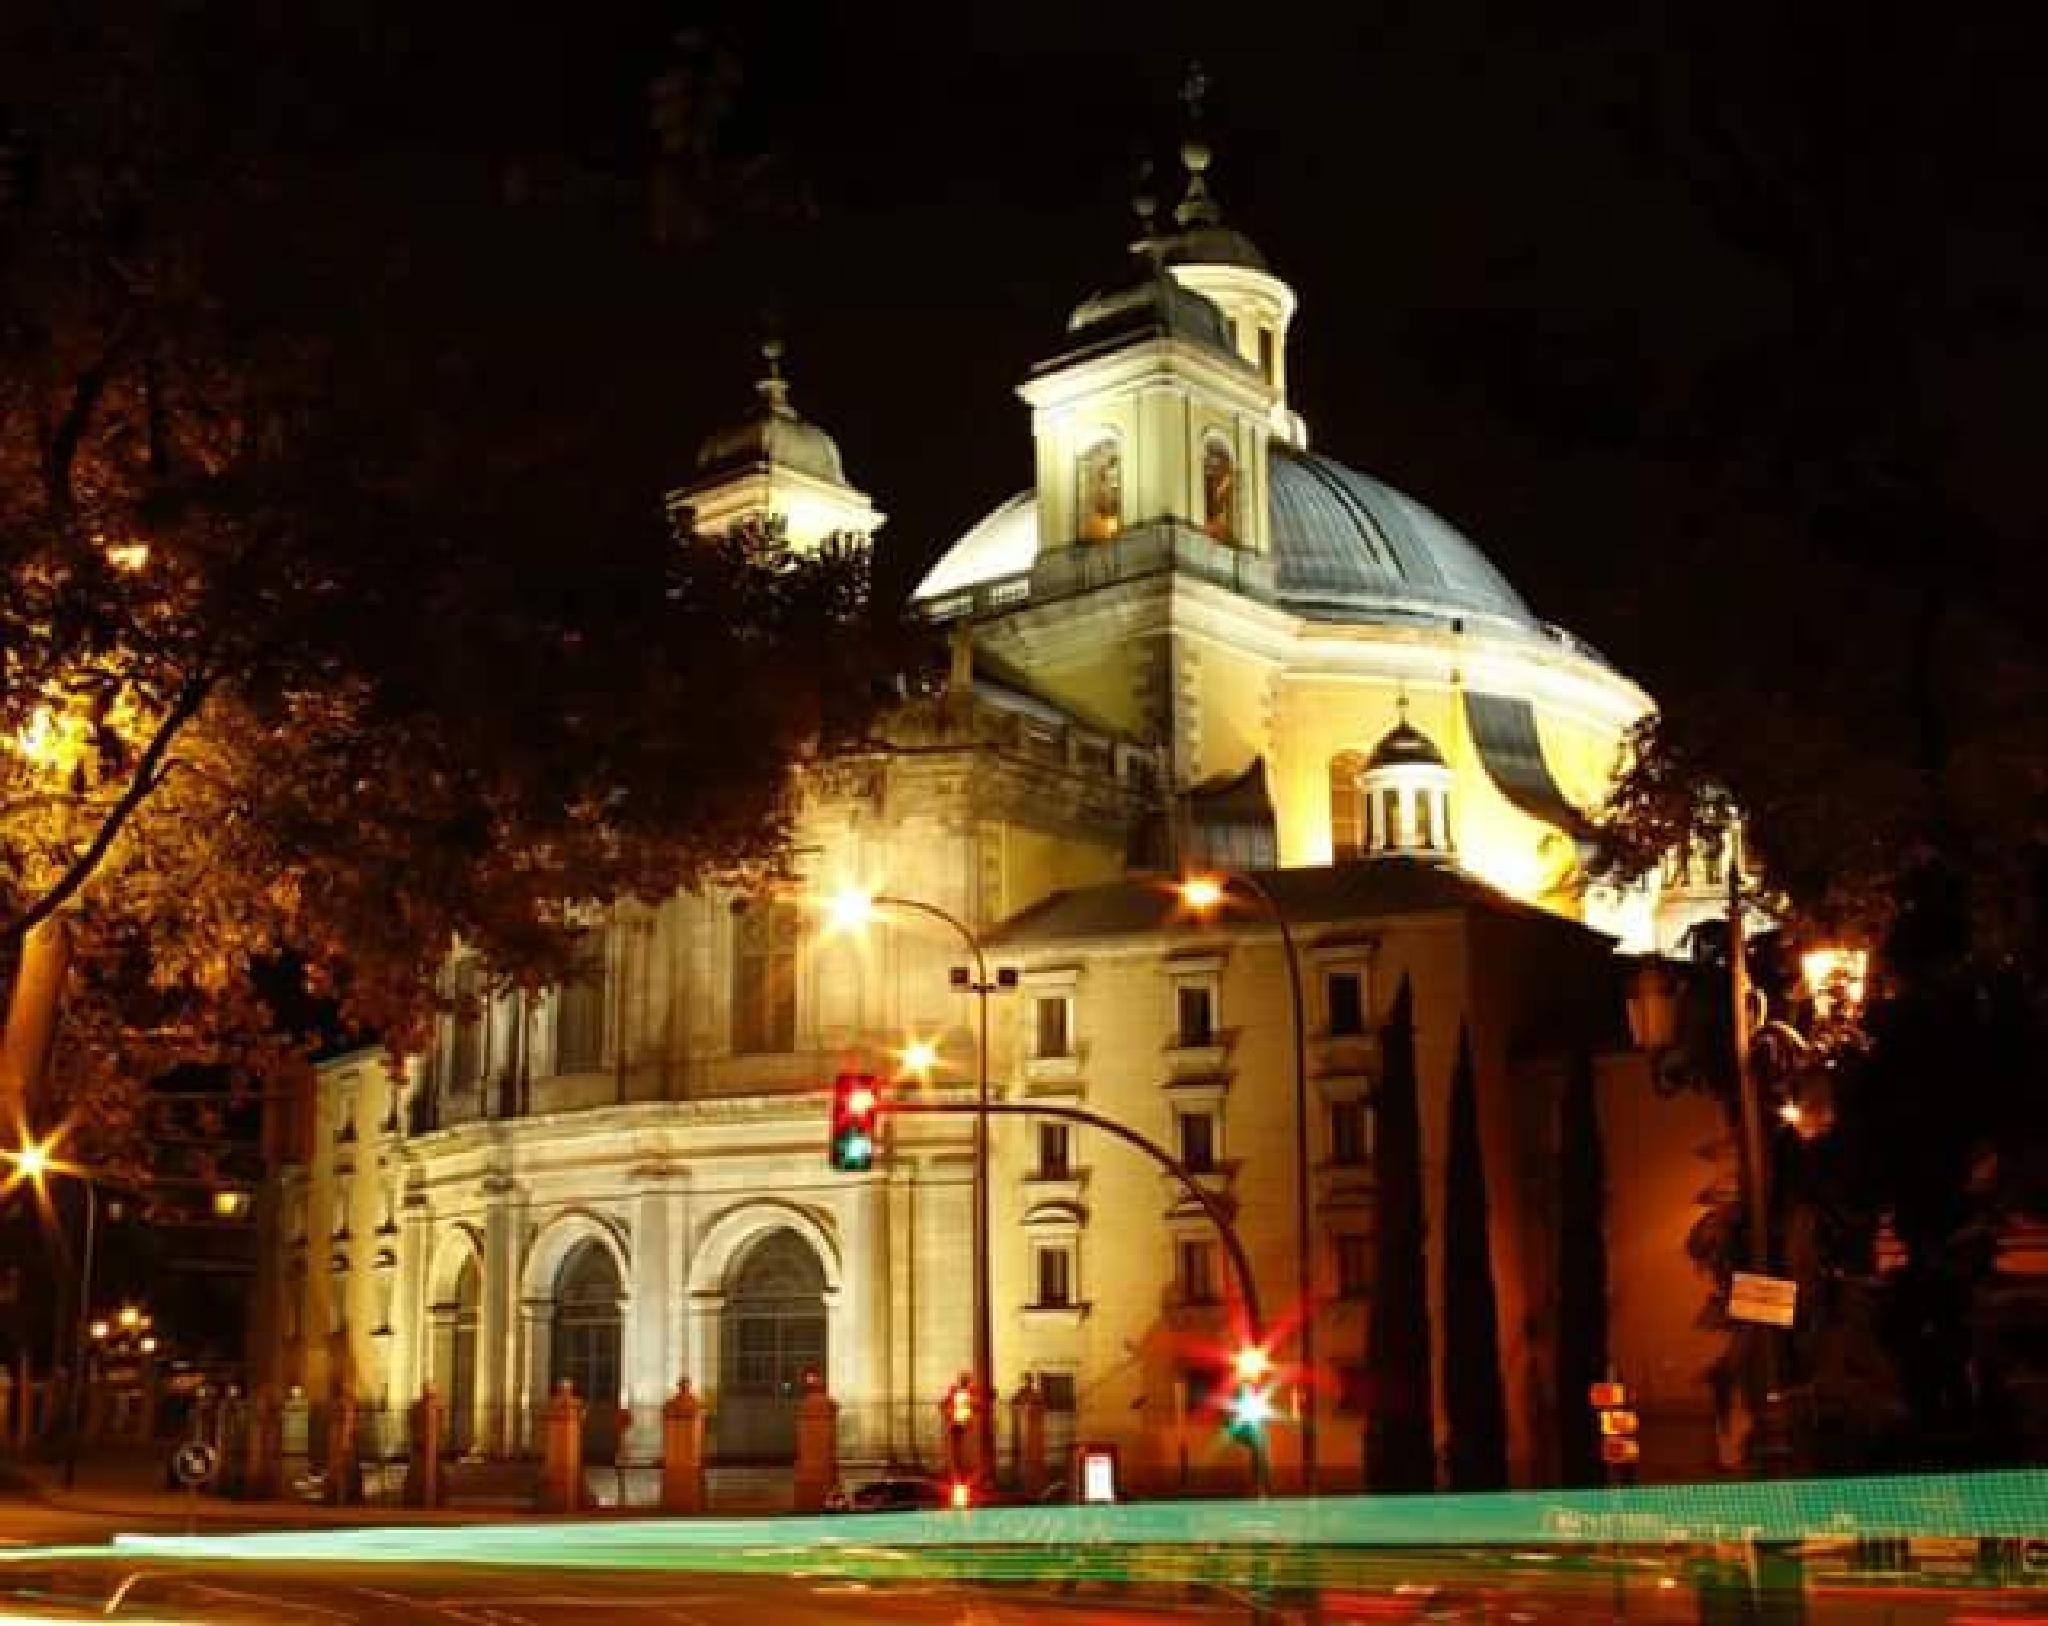 the San Francisco basilic, Madrid by lorenzo.lourencothierry